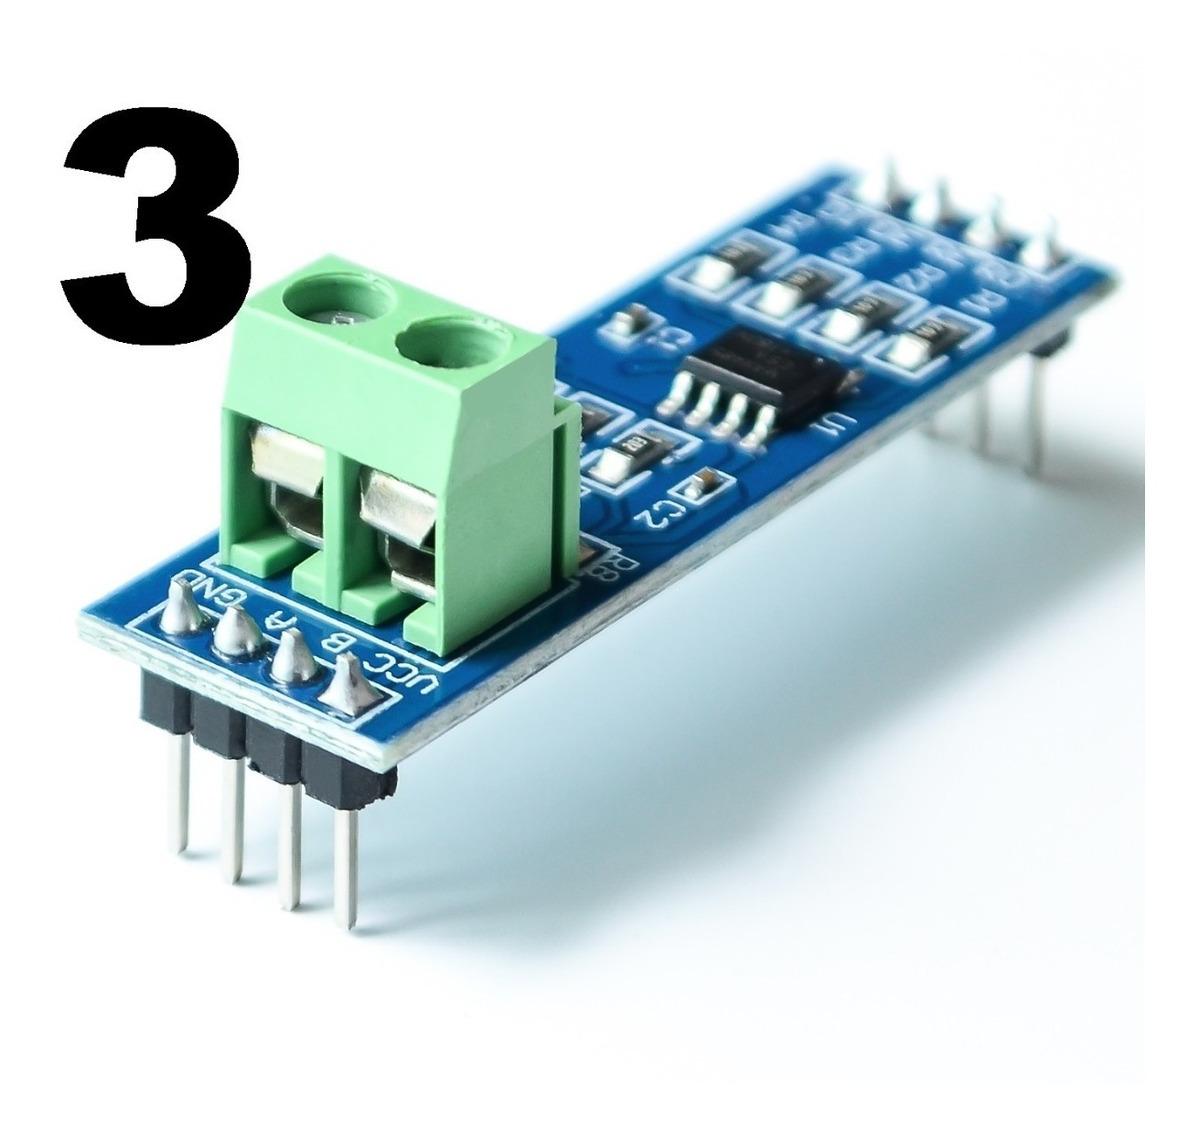 3 Conversor Rs485 Serial Max485 Pra Arduino Nodemcu Esp32